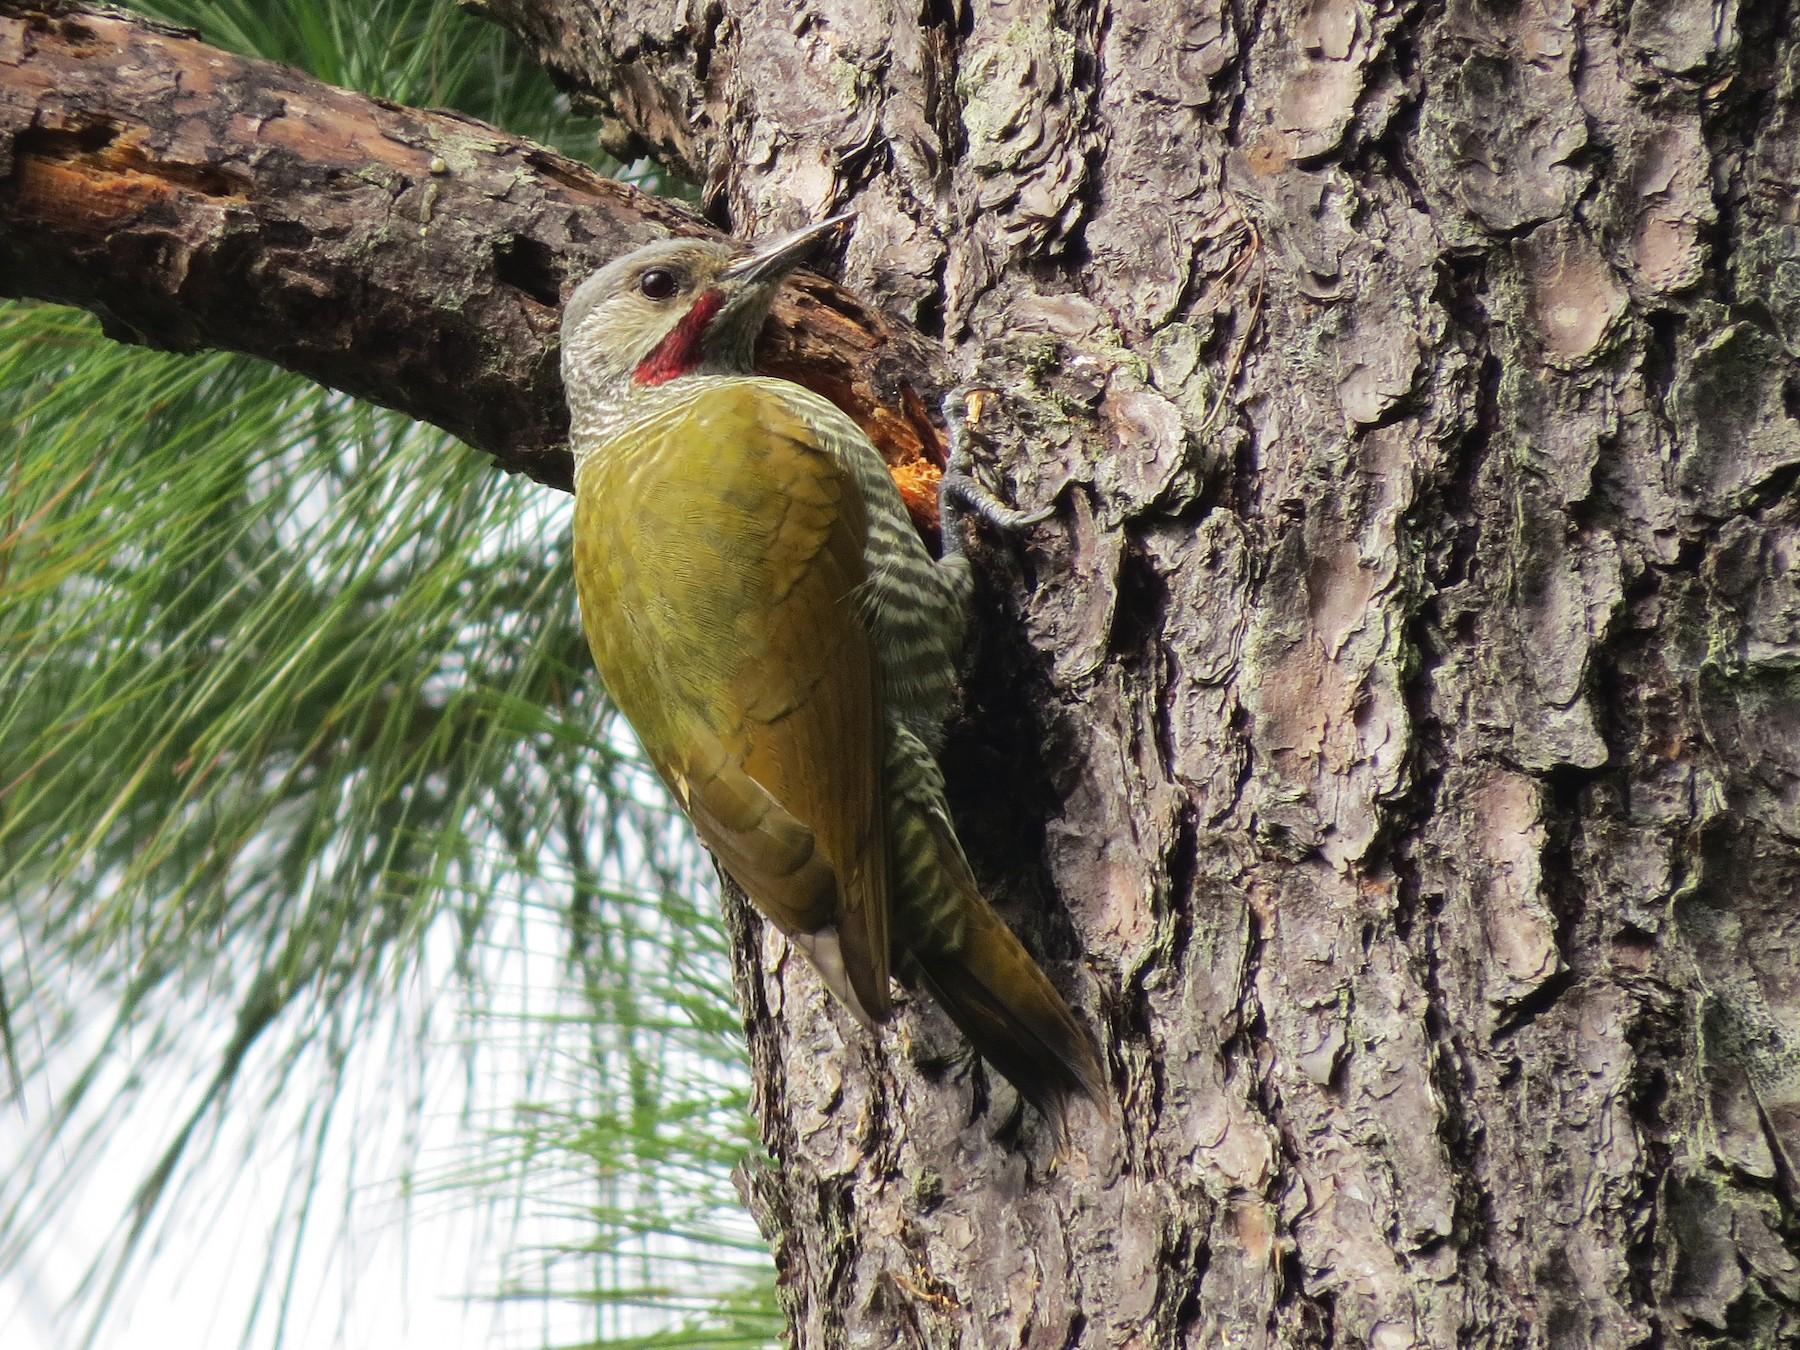 Gray-crowned Woodpecker - Esteban Mendez